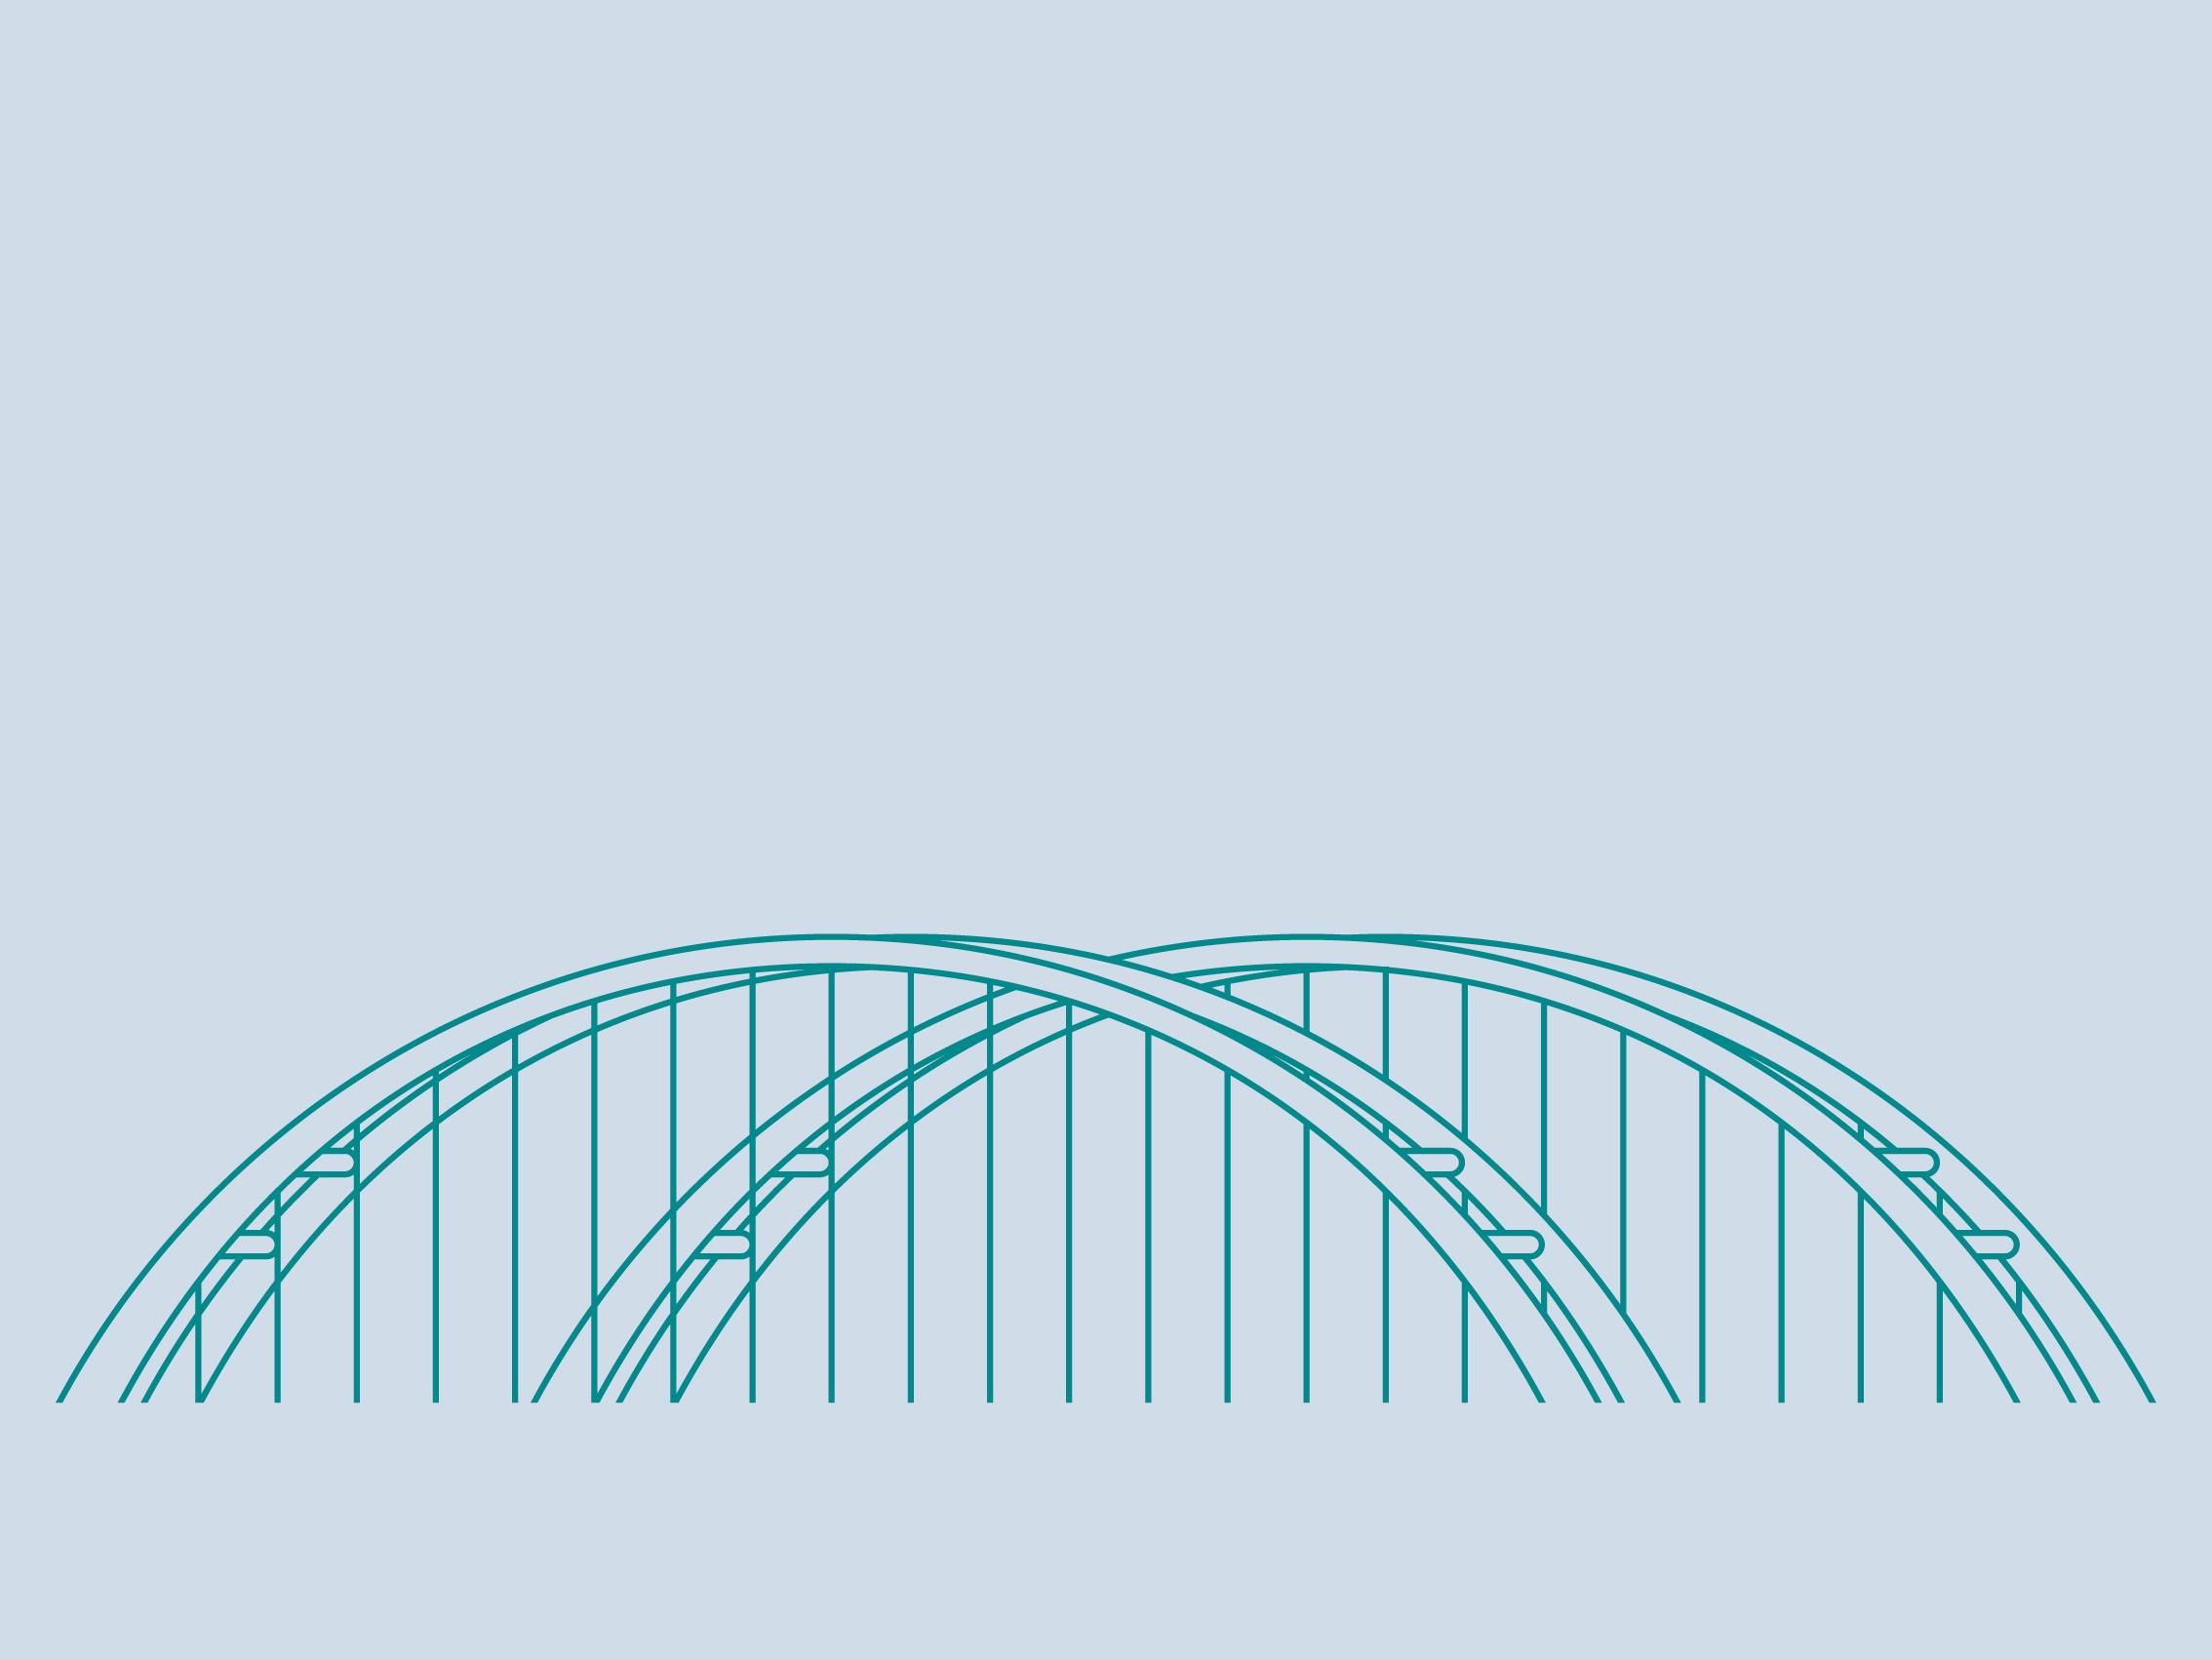 Landmarks_Wainwrights-Bridge